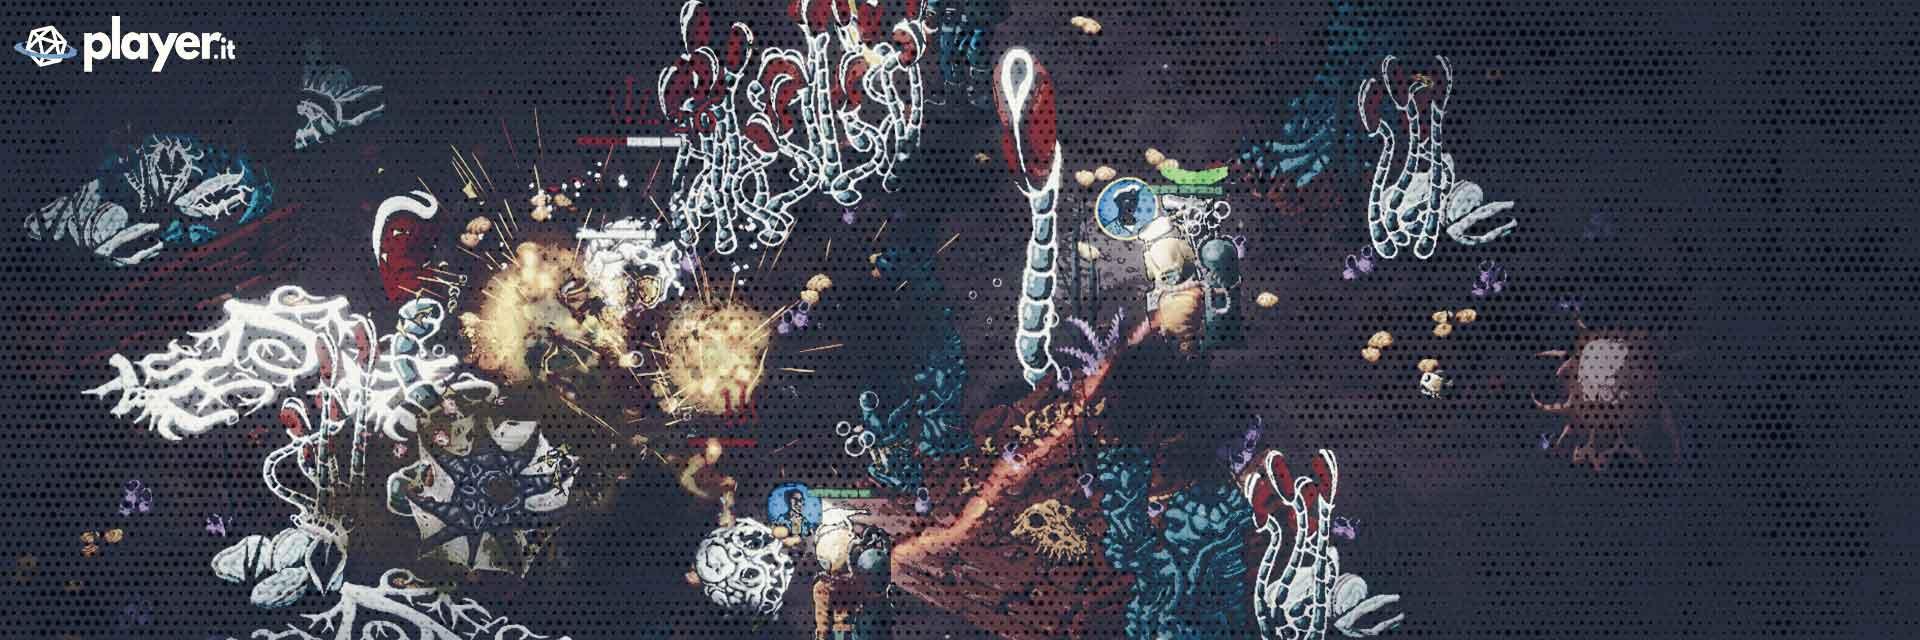 Stirring Abyss: trama, gameplay e trailer